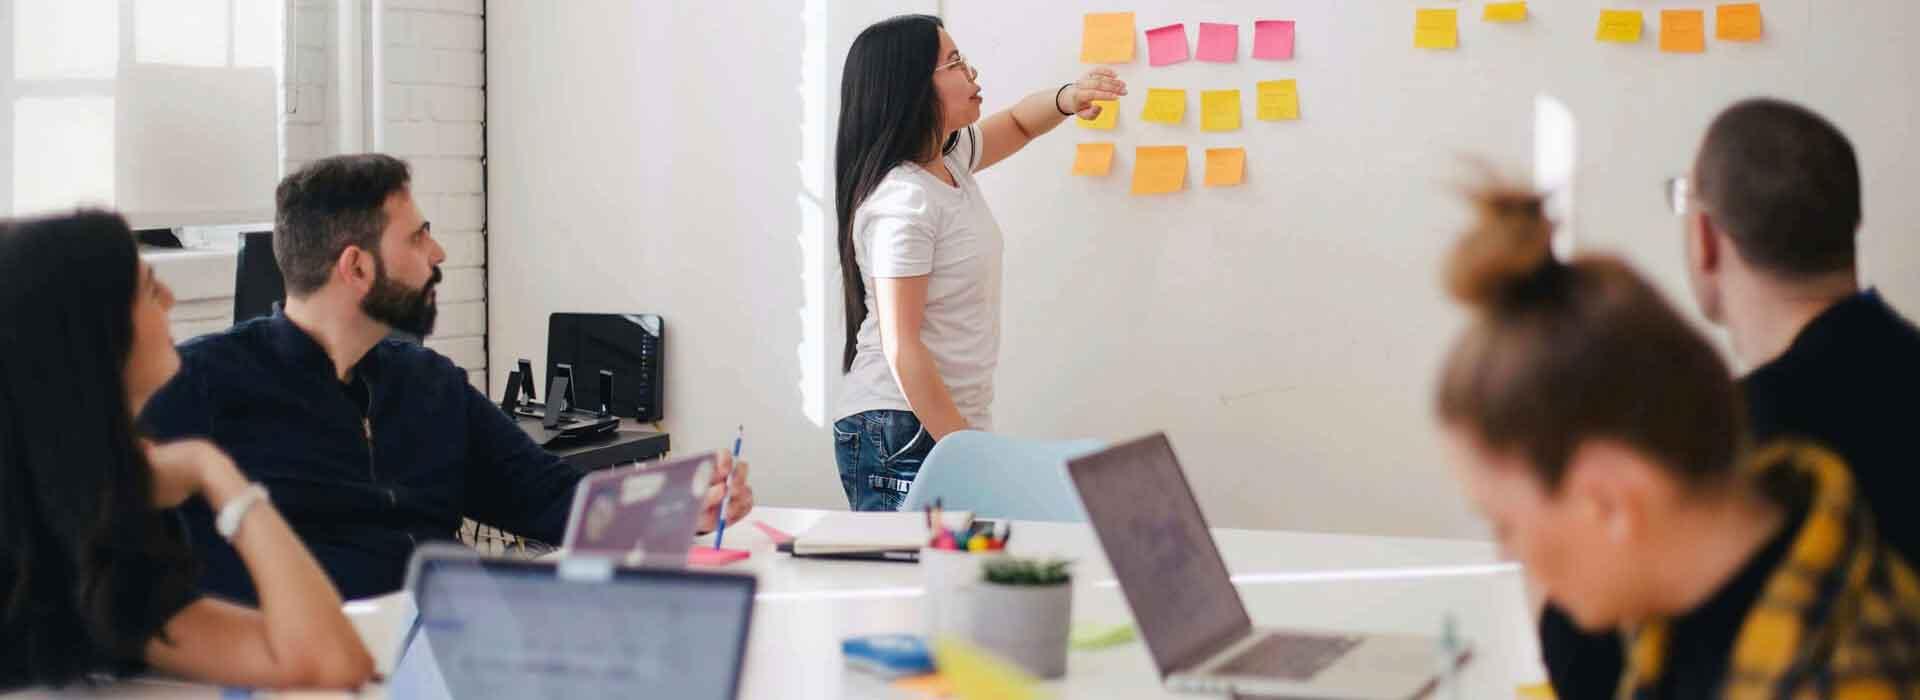 integrated digital marketing team around whiteboard